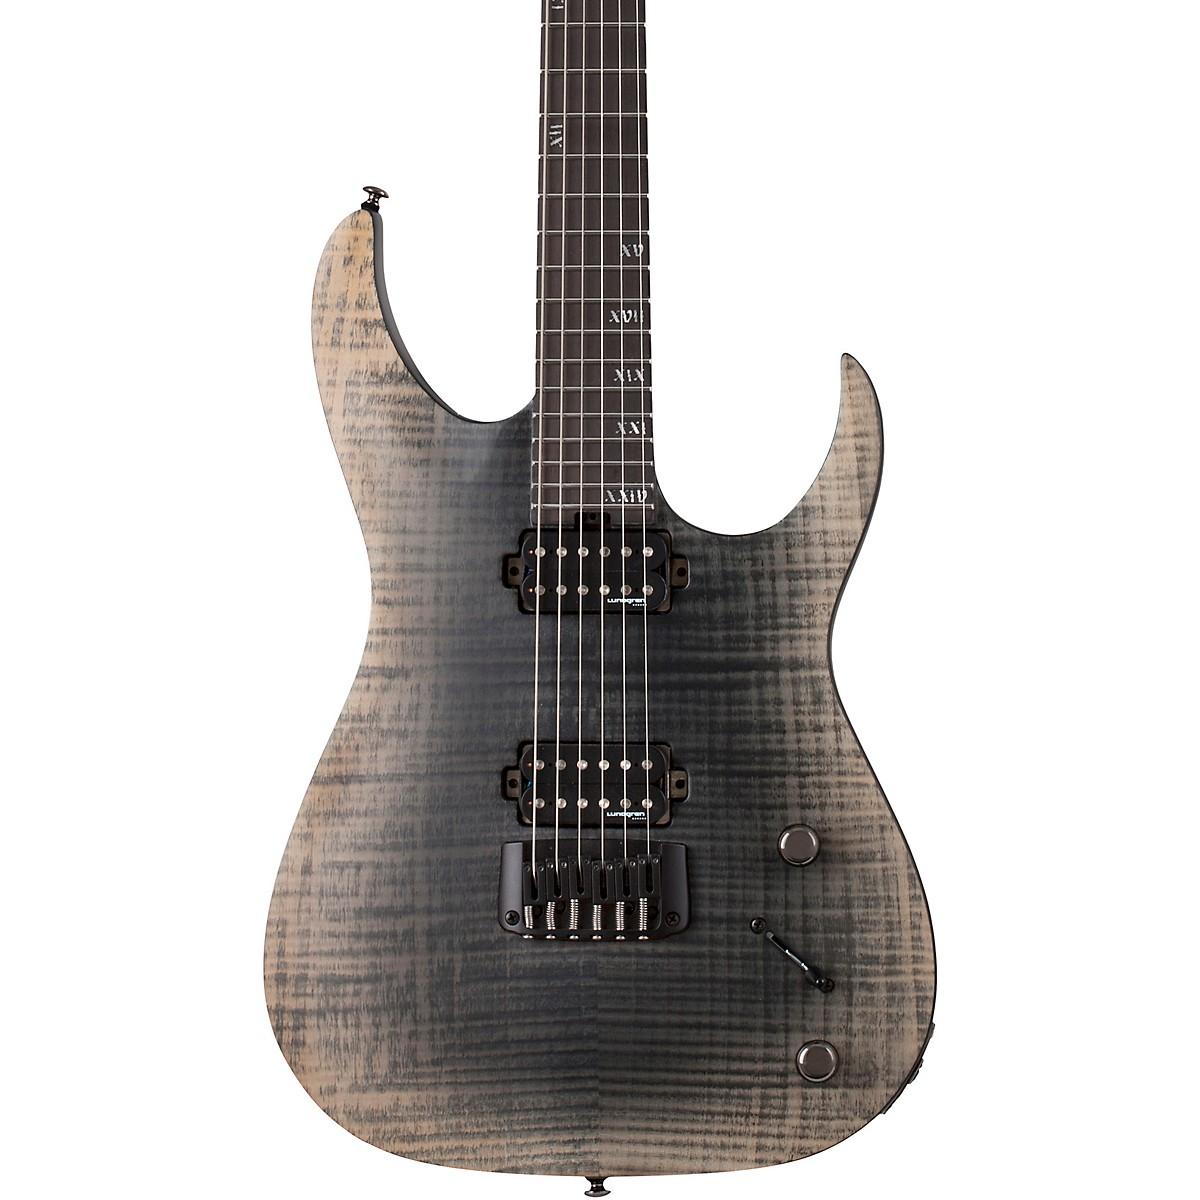 Schecter Guitar Research Banshee Mach 6-String Electric Guitar